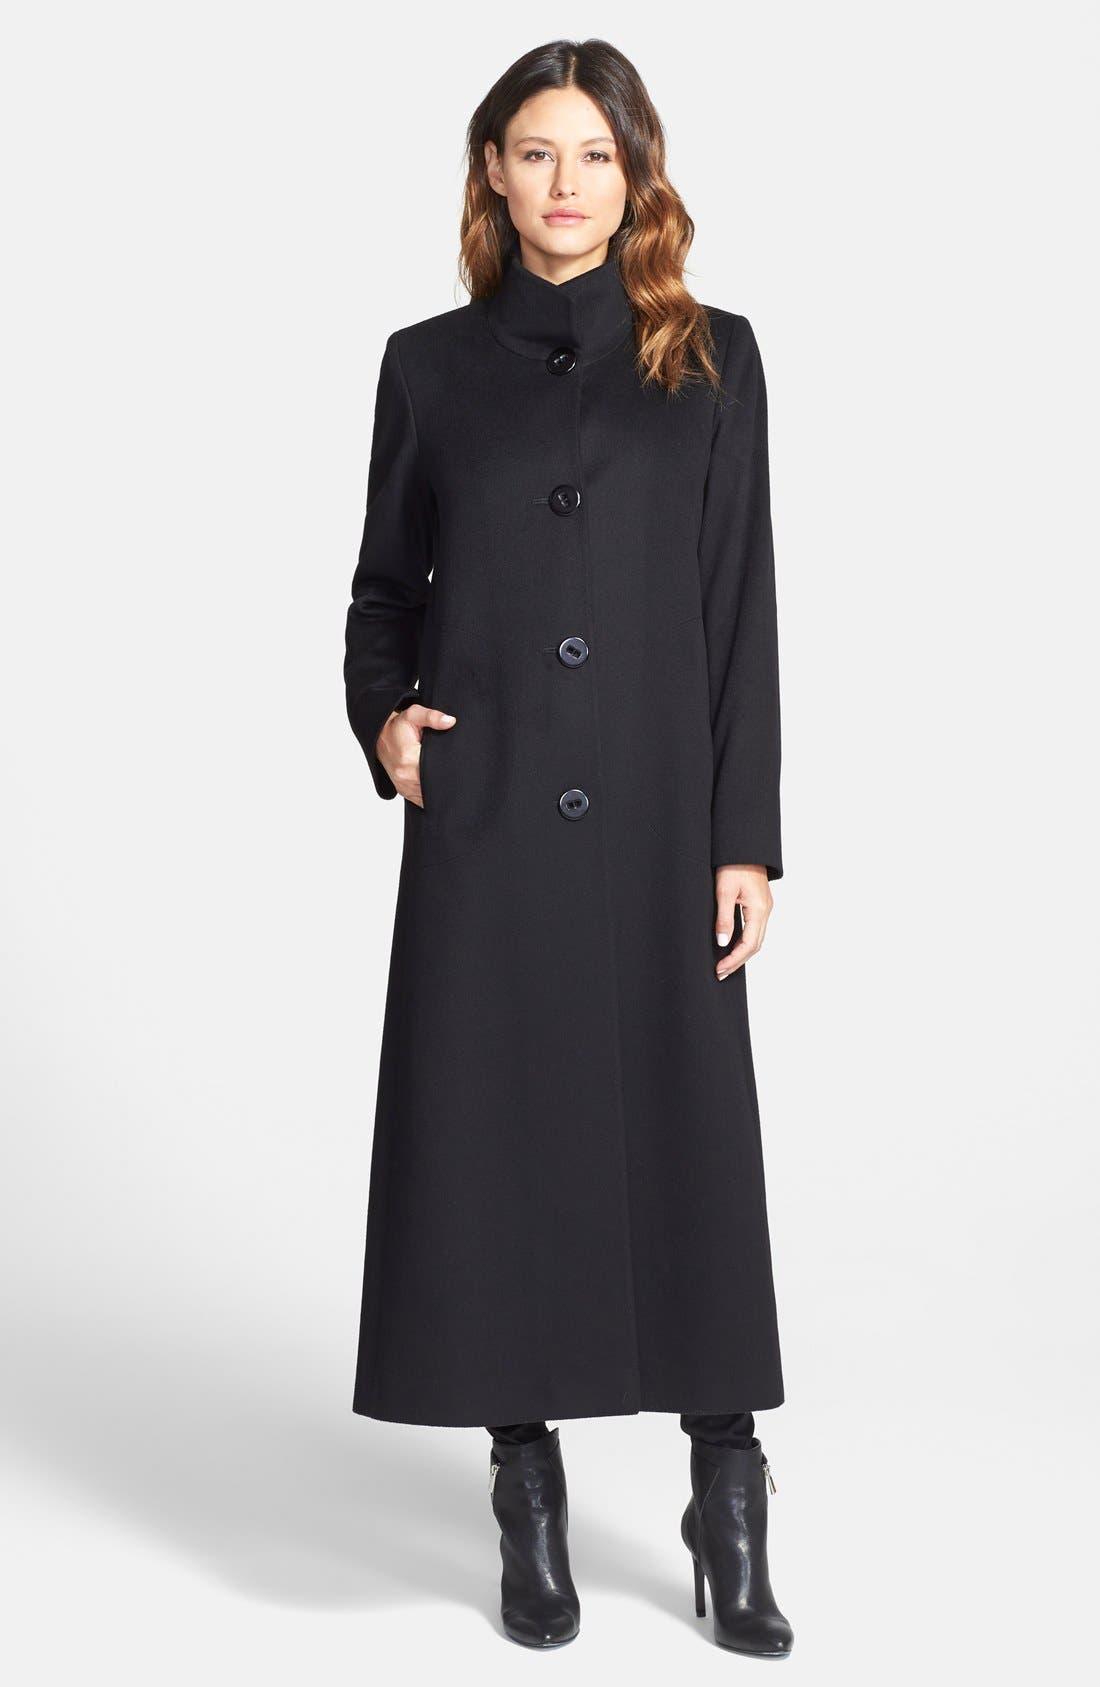 Alternate Image 1 Selected - Fleurette Stand Collar Long Cashmere Coat